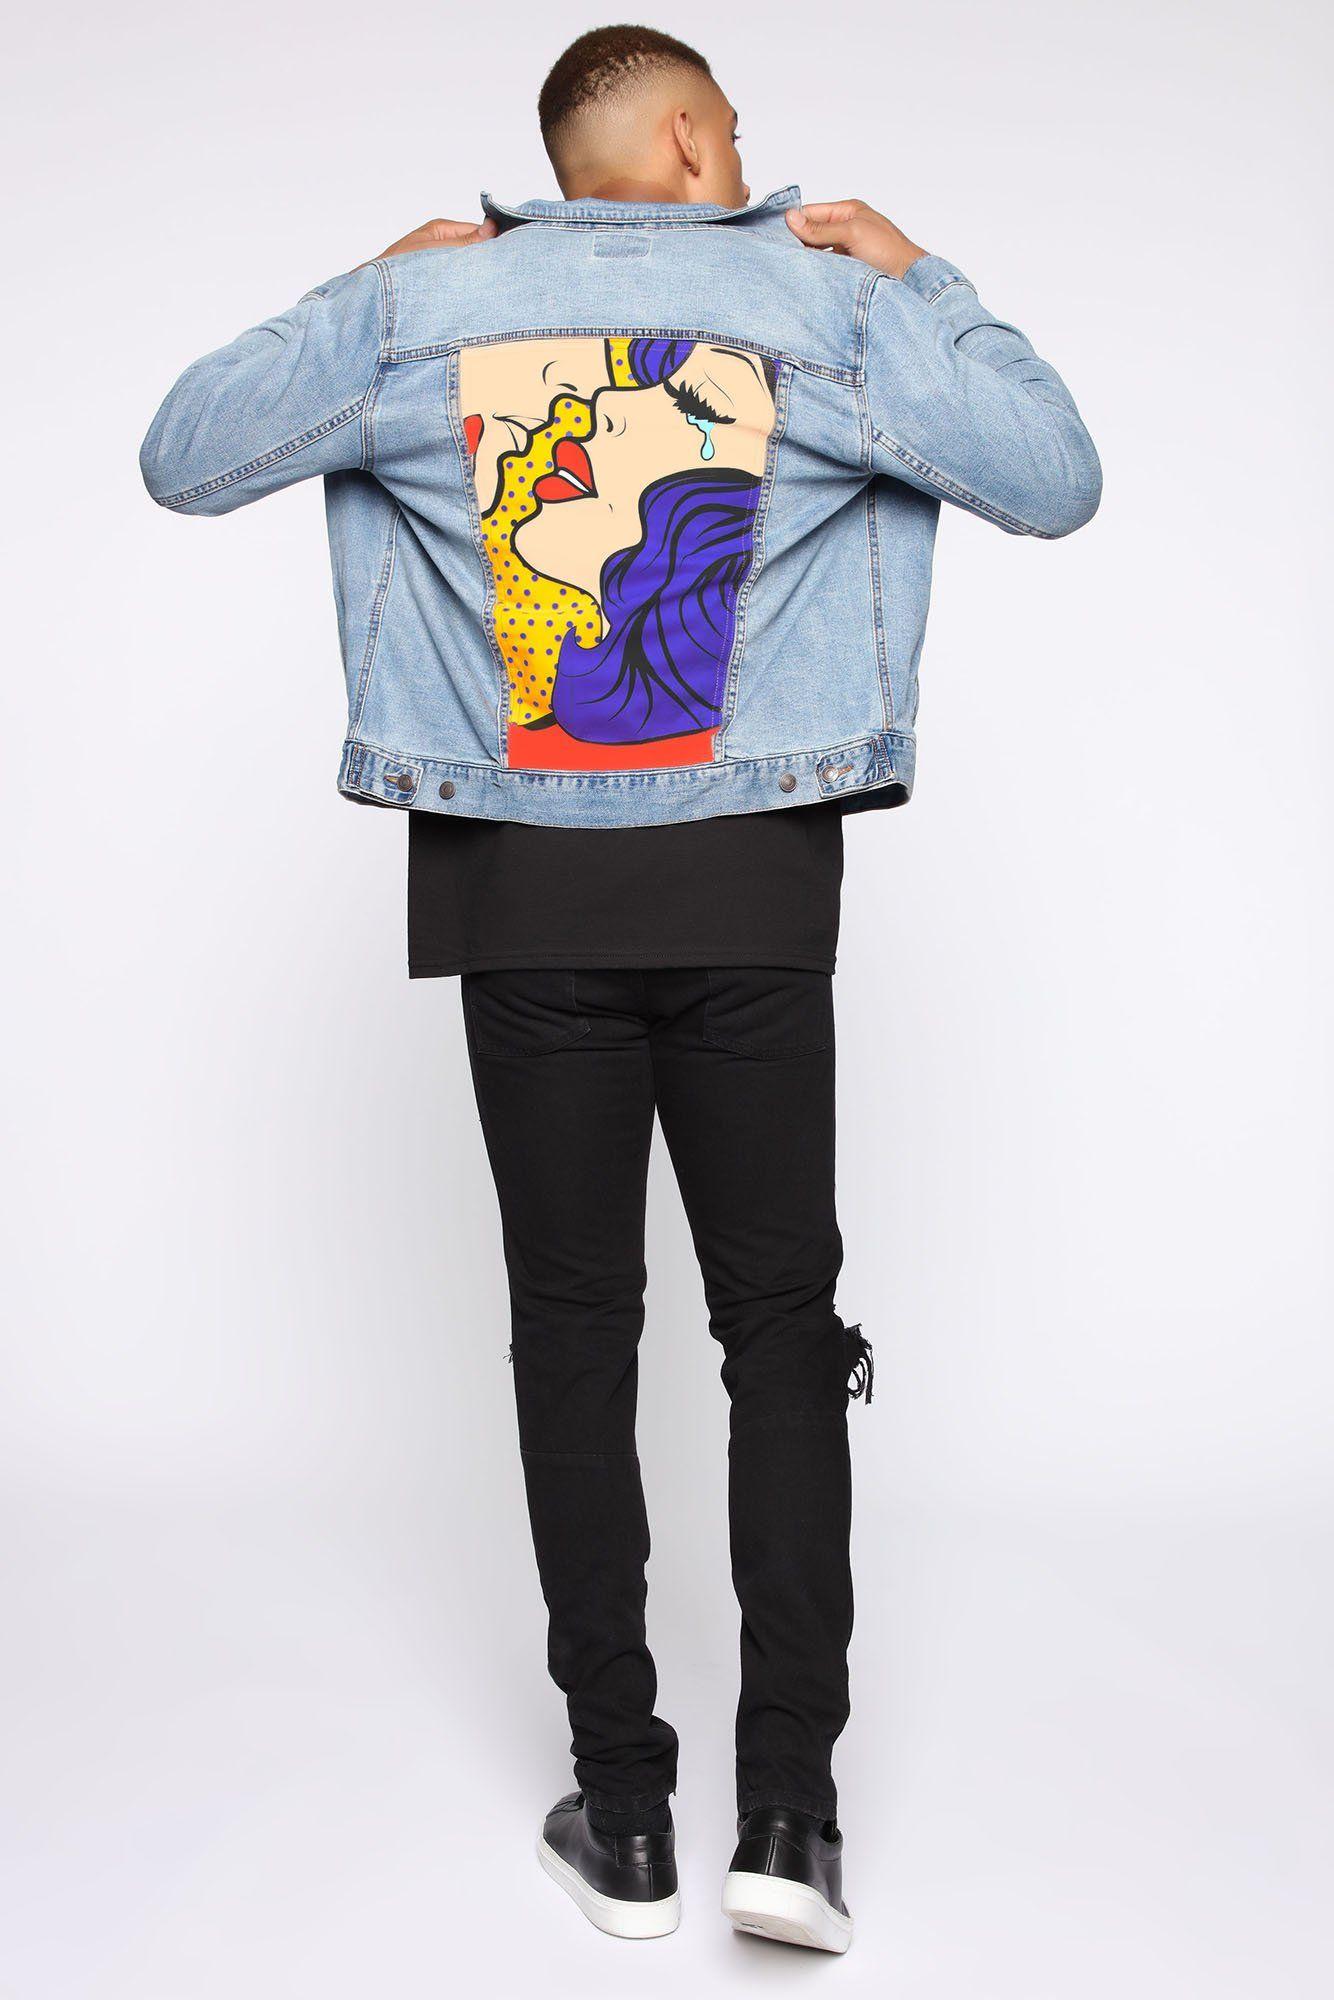 Bae Denim Jacket Lightwash In 2021 Denim Jacket Denim Jacket Fashion Jackets [ 2000 x 1334 Pixel ]